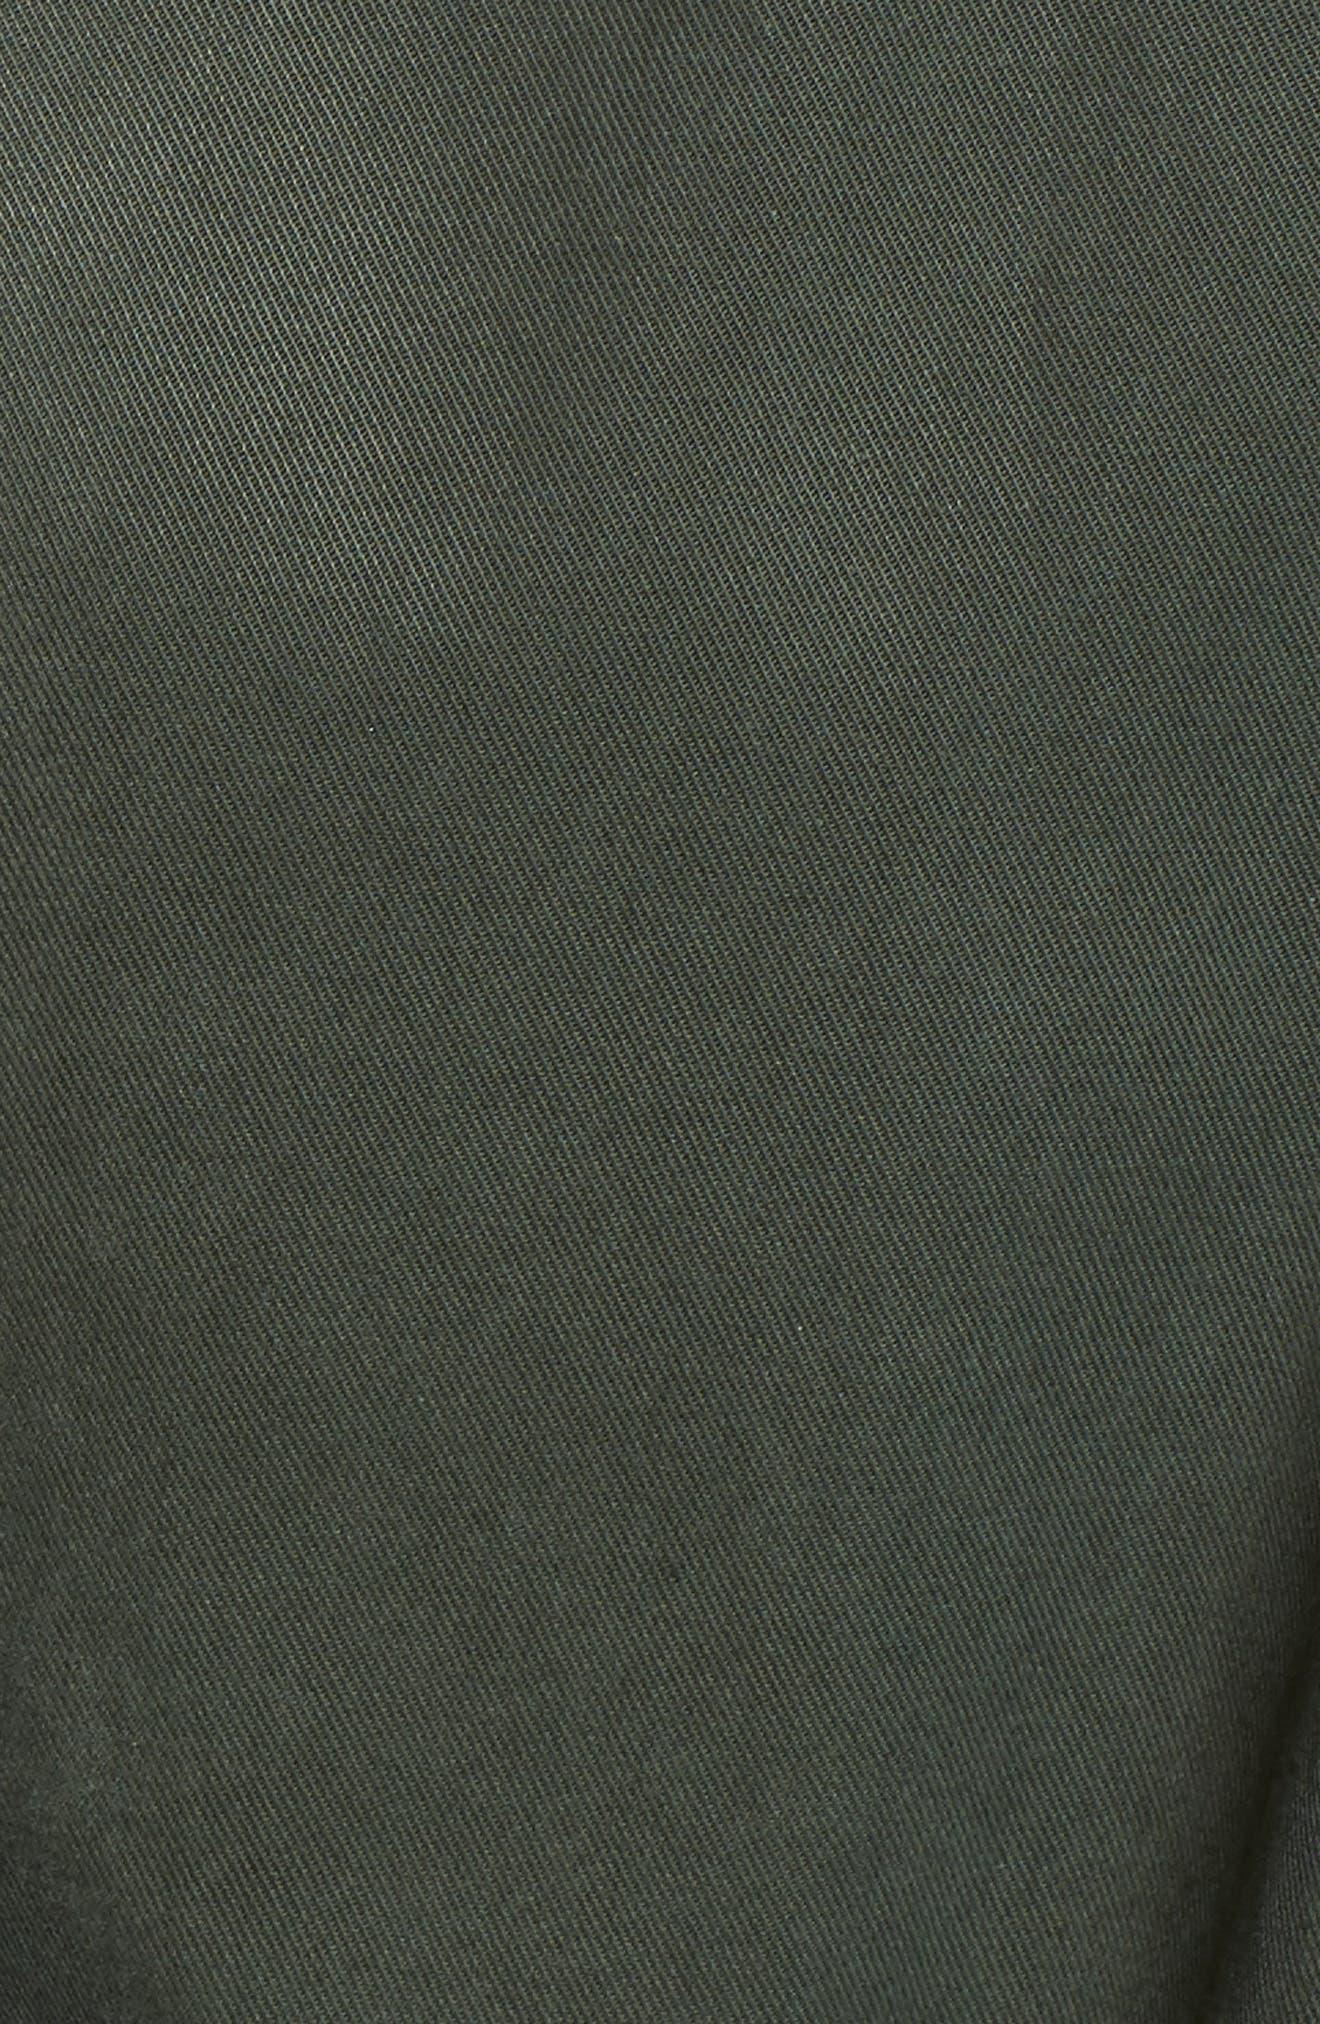 Brannen Military Jacket,                             Alternate thumbnail 7, color,                             310